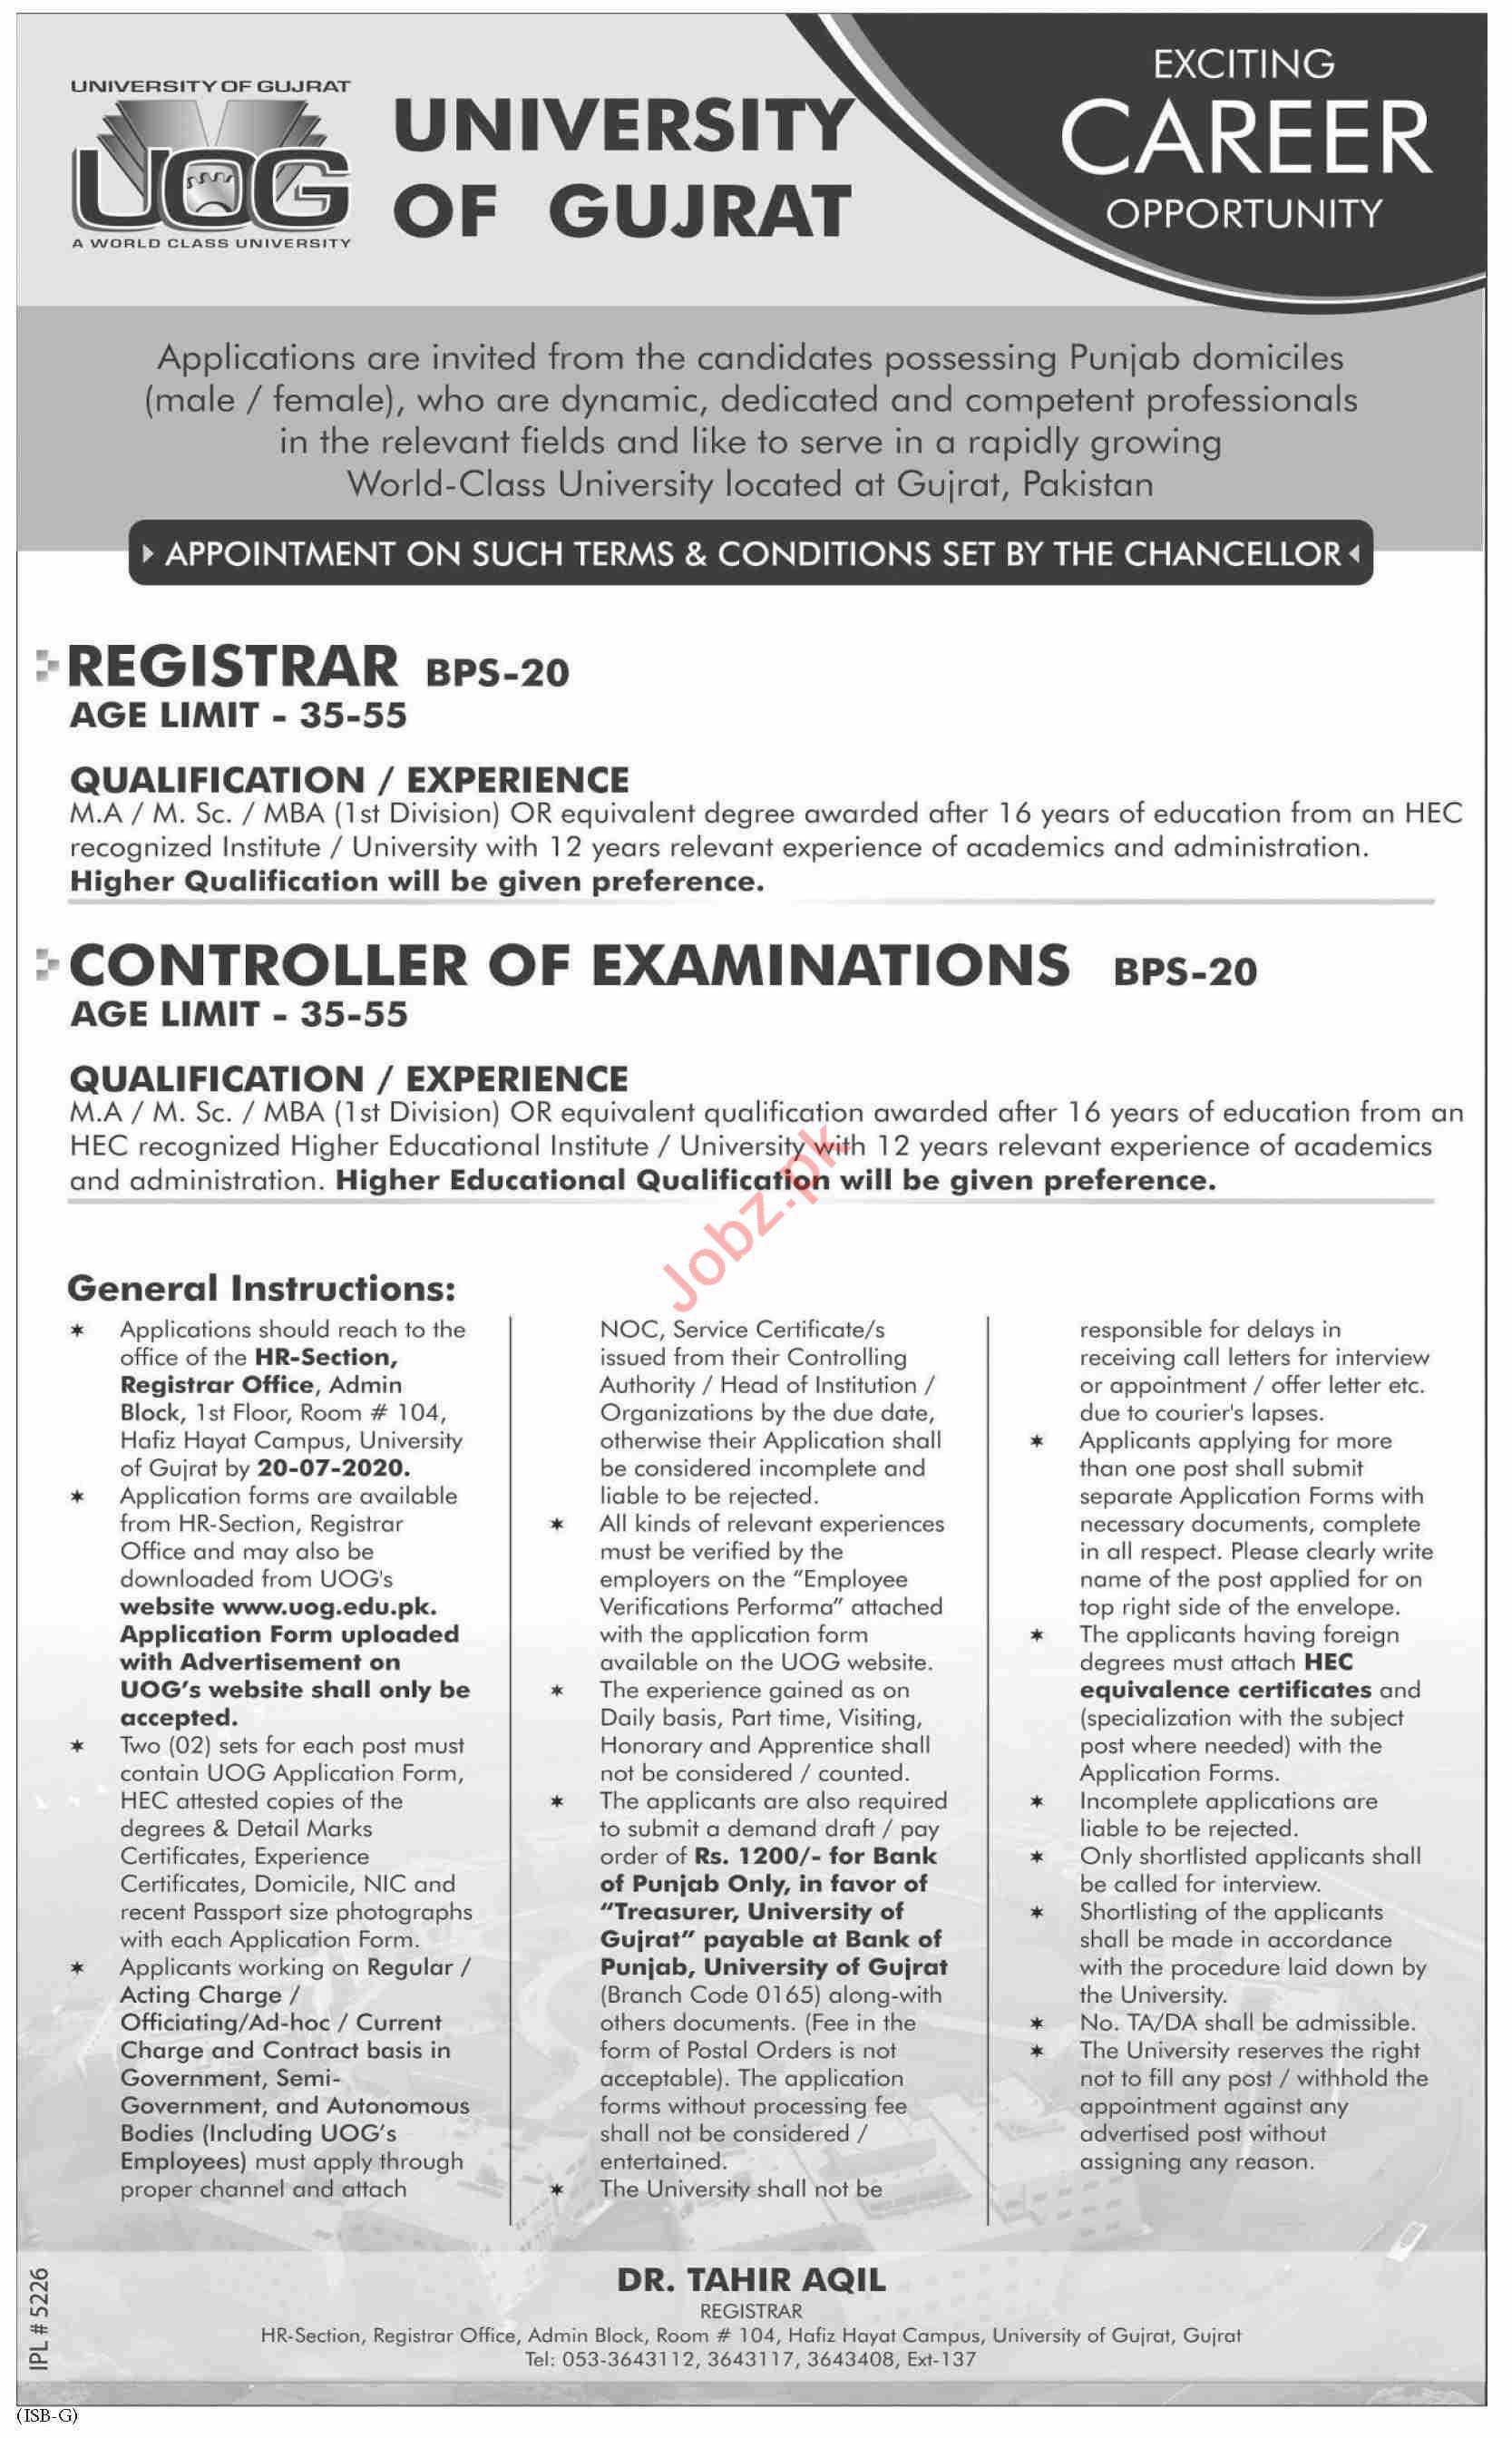 University of Gujrat UOG Jobs 2020 for Registrars